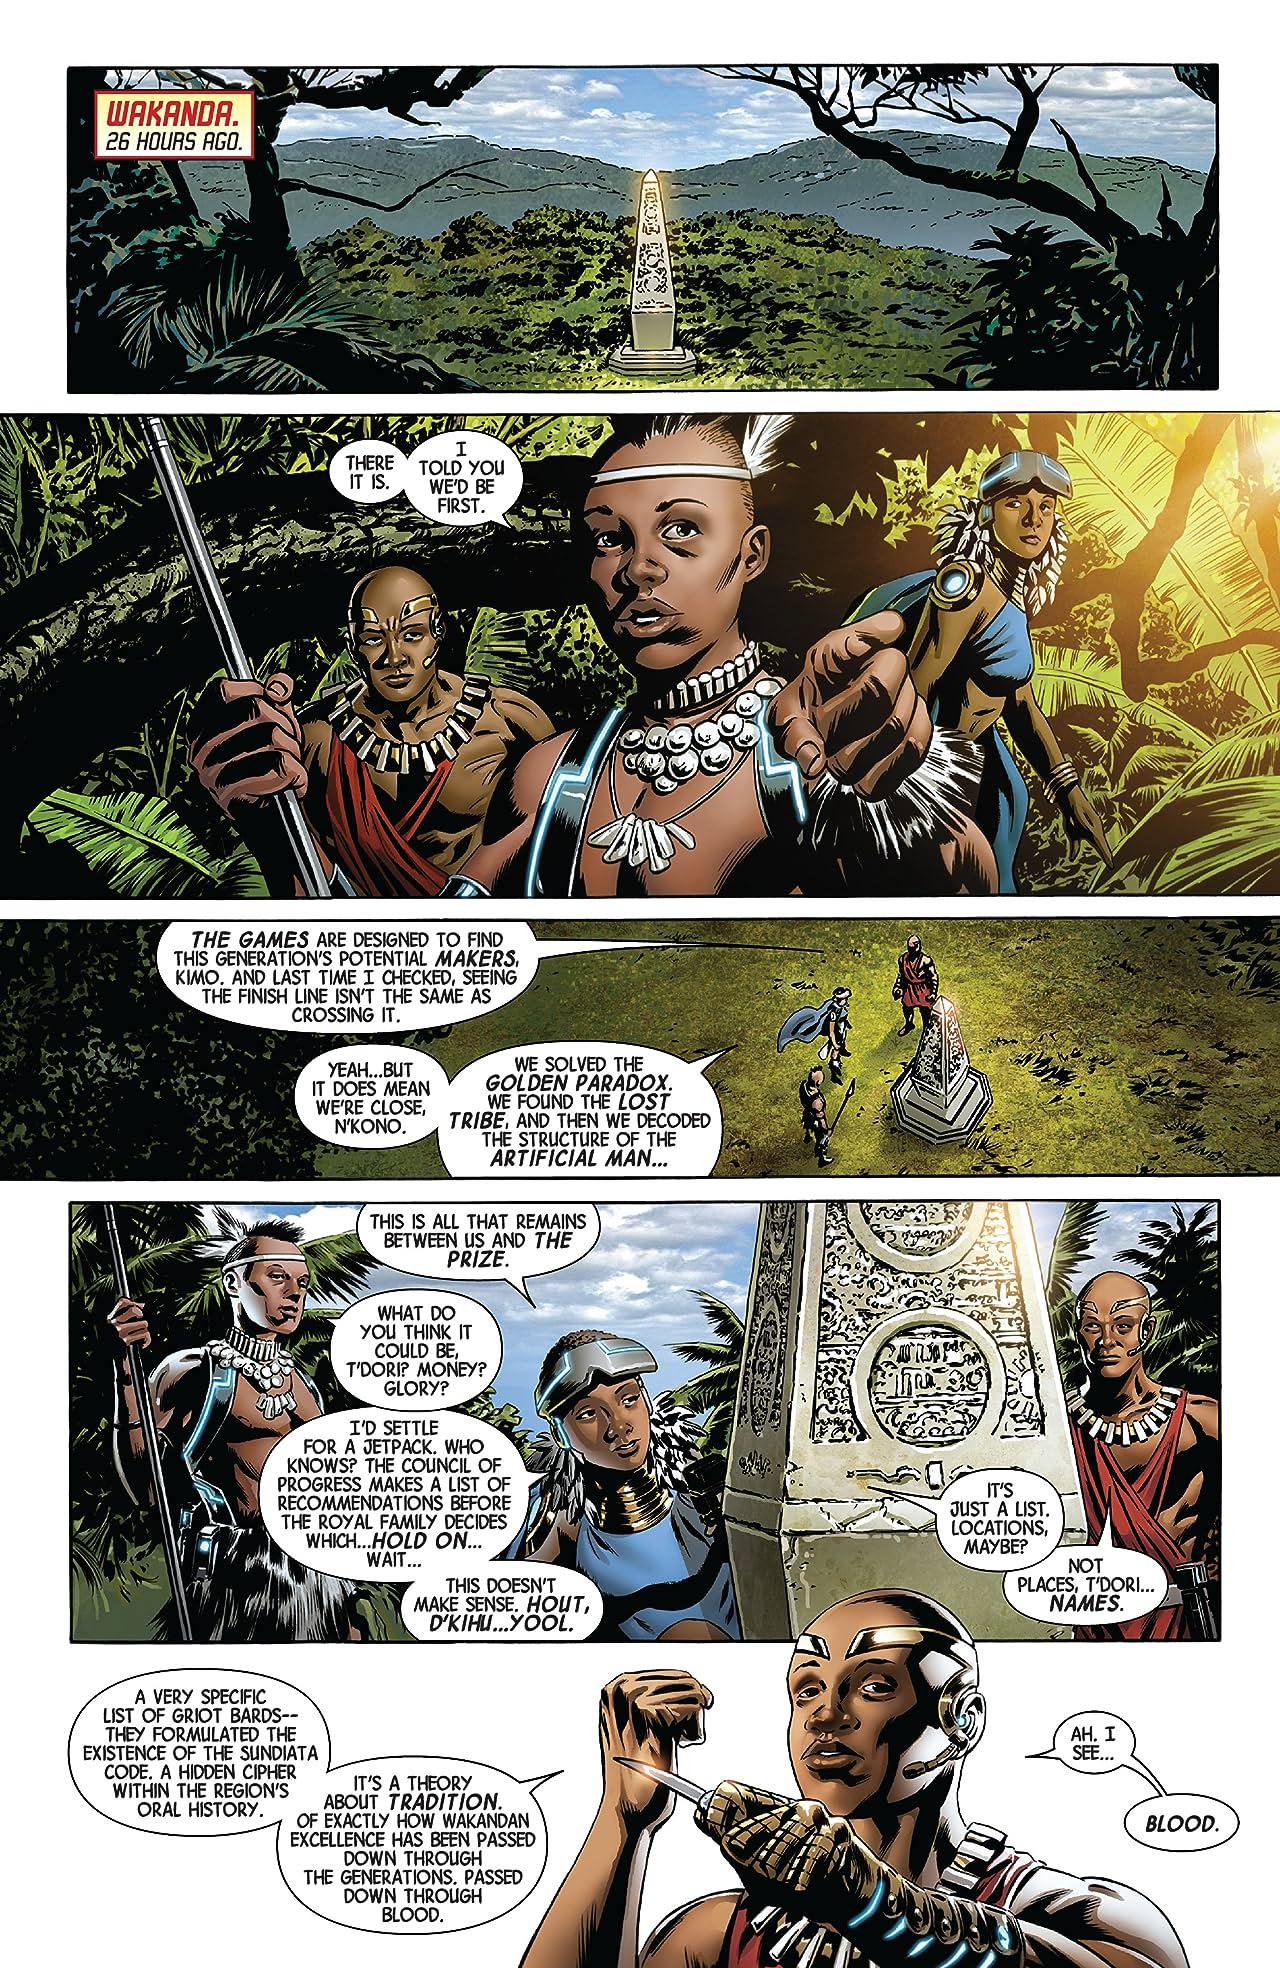 New Avengers by Jonathan Hickman Vol. 1